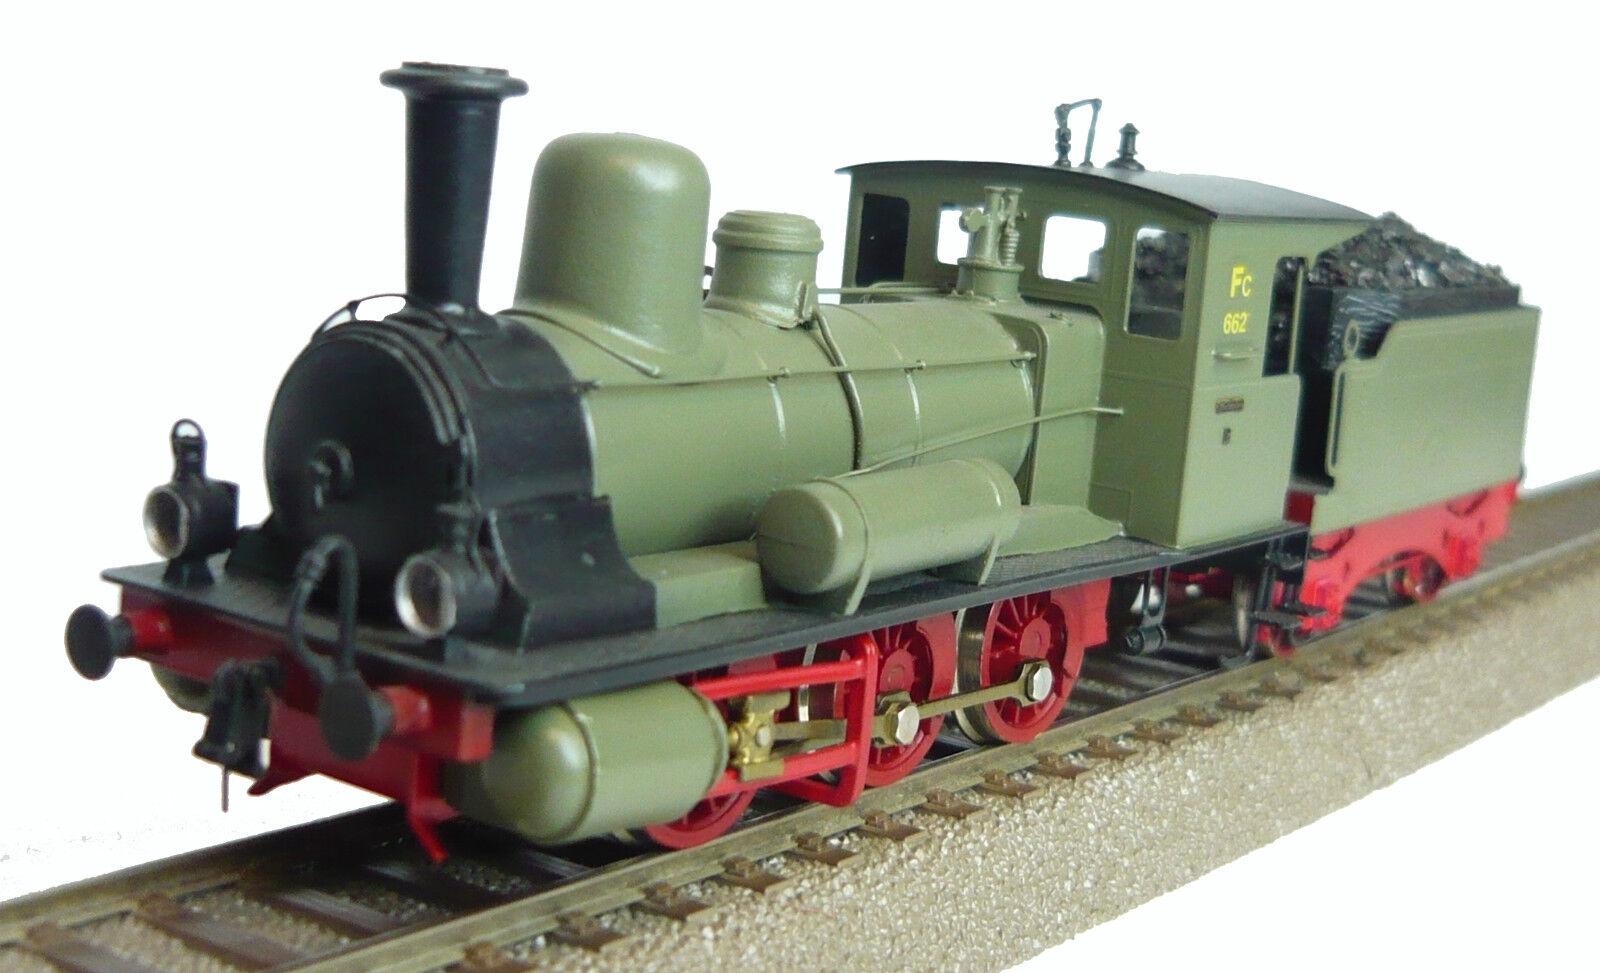 Intermodel 87052 Freight Train Steam Locomotive 662 I fear FC The K. I fear. STS. B. New & in Original Box